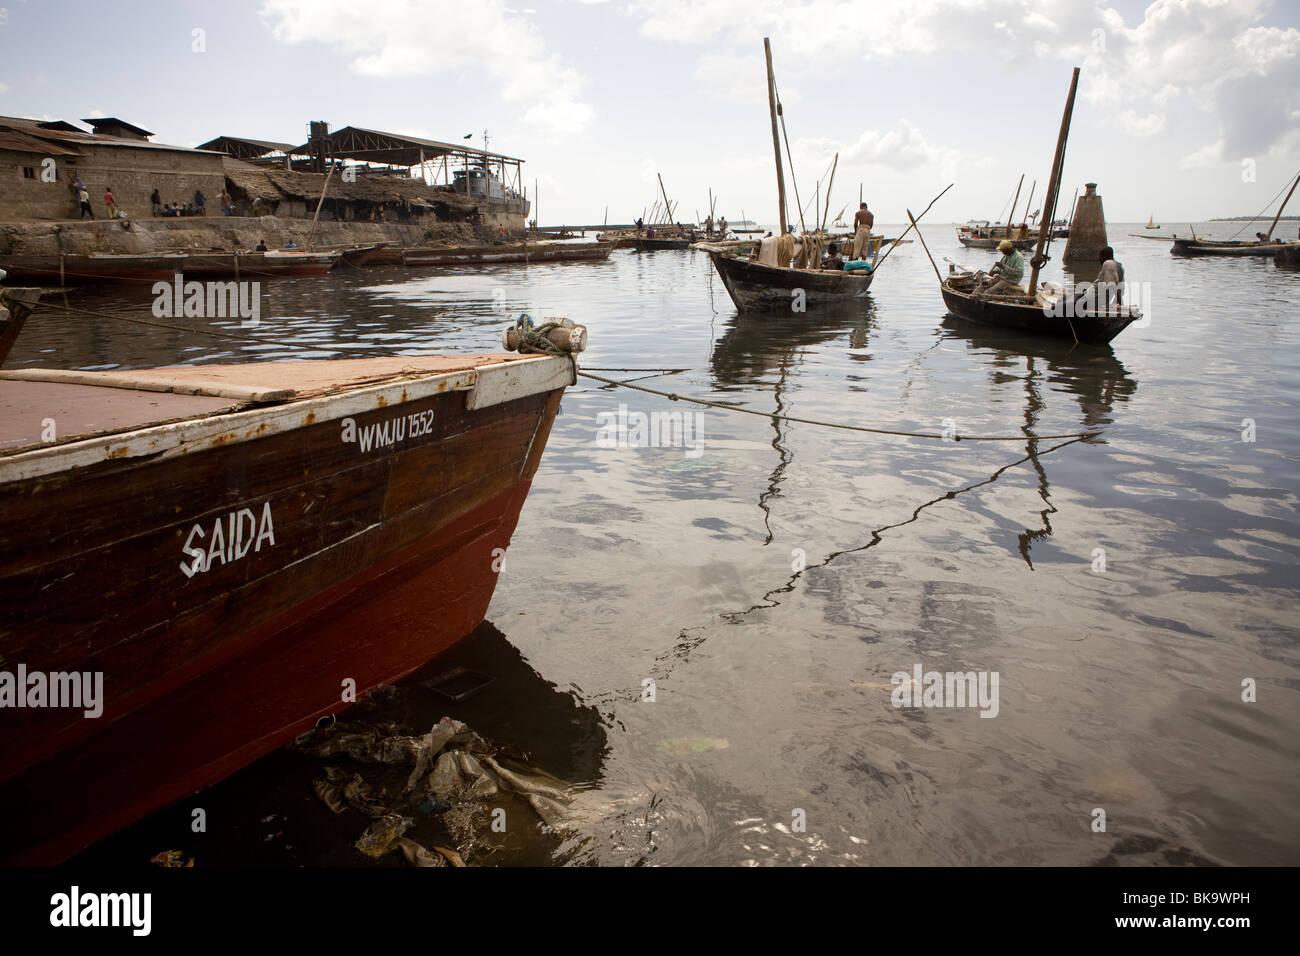 Harbor - Stonetown, Zanzibar, Tanzania. - Stock Image